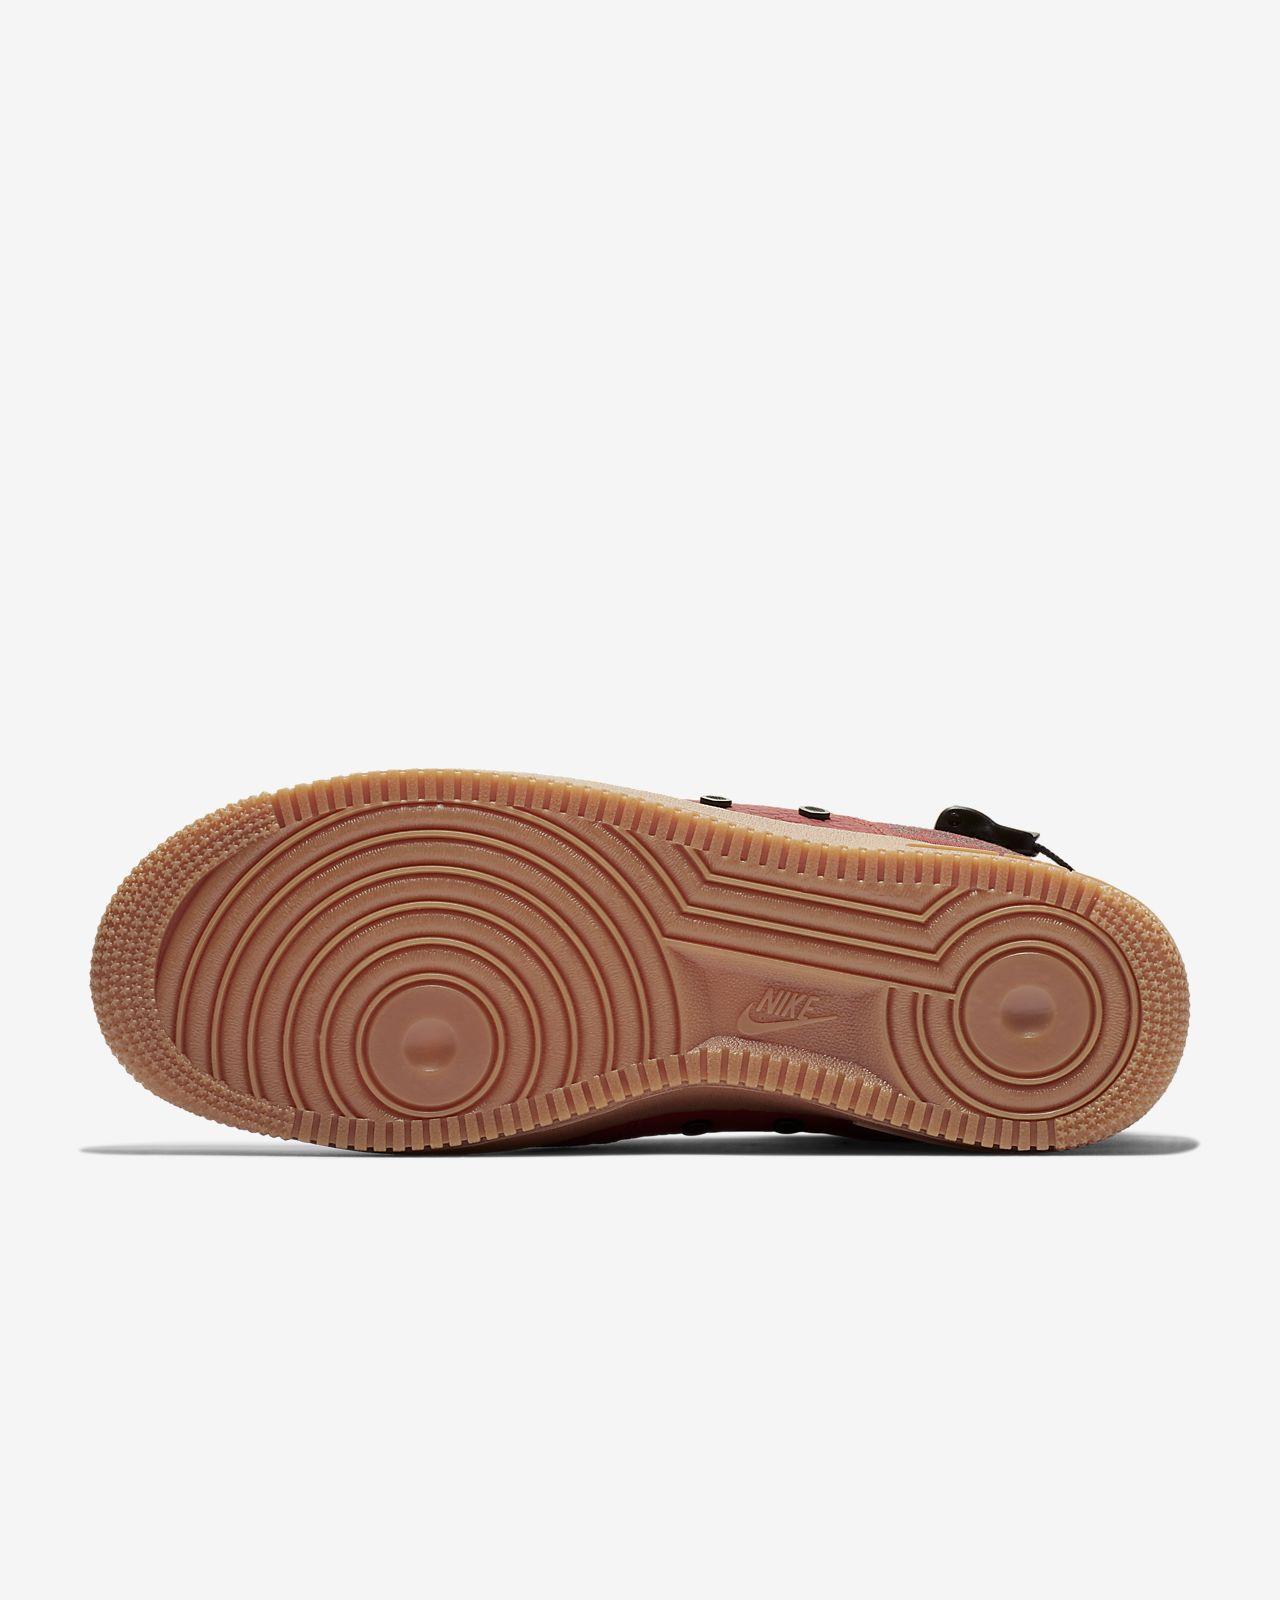 huge selection of 3e6e2 ad3d8 ... Nike SF Air Force 1 Mid Mens Shoe